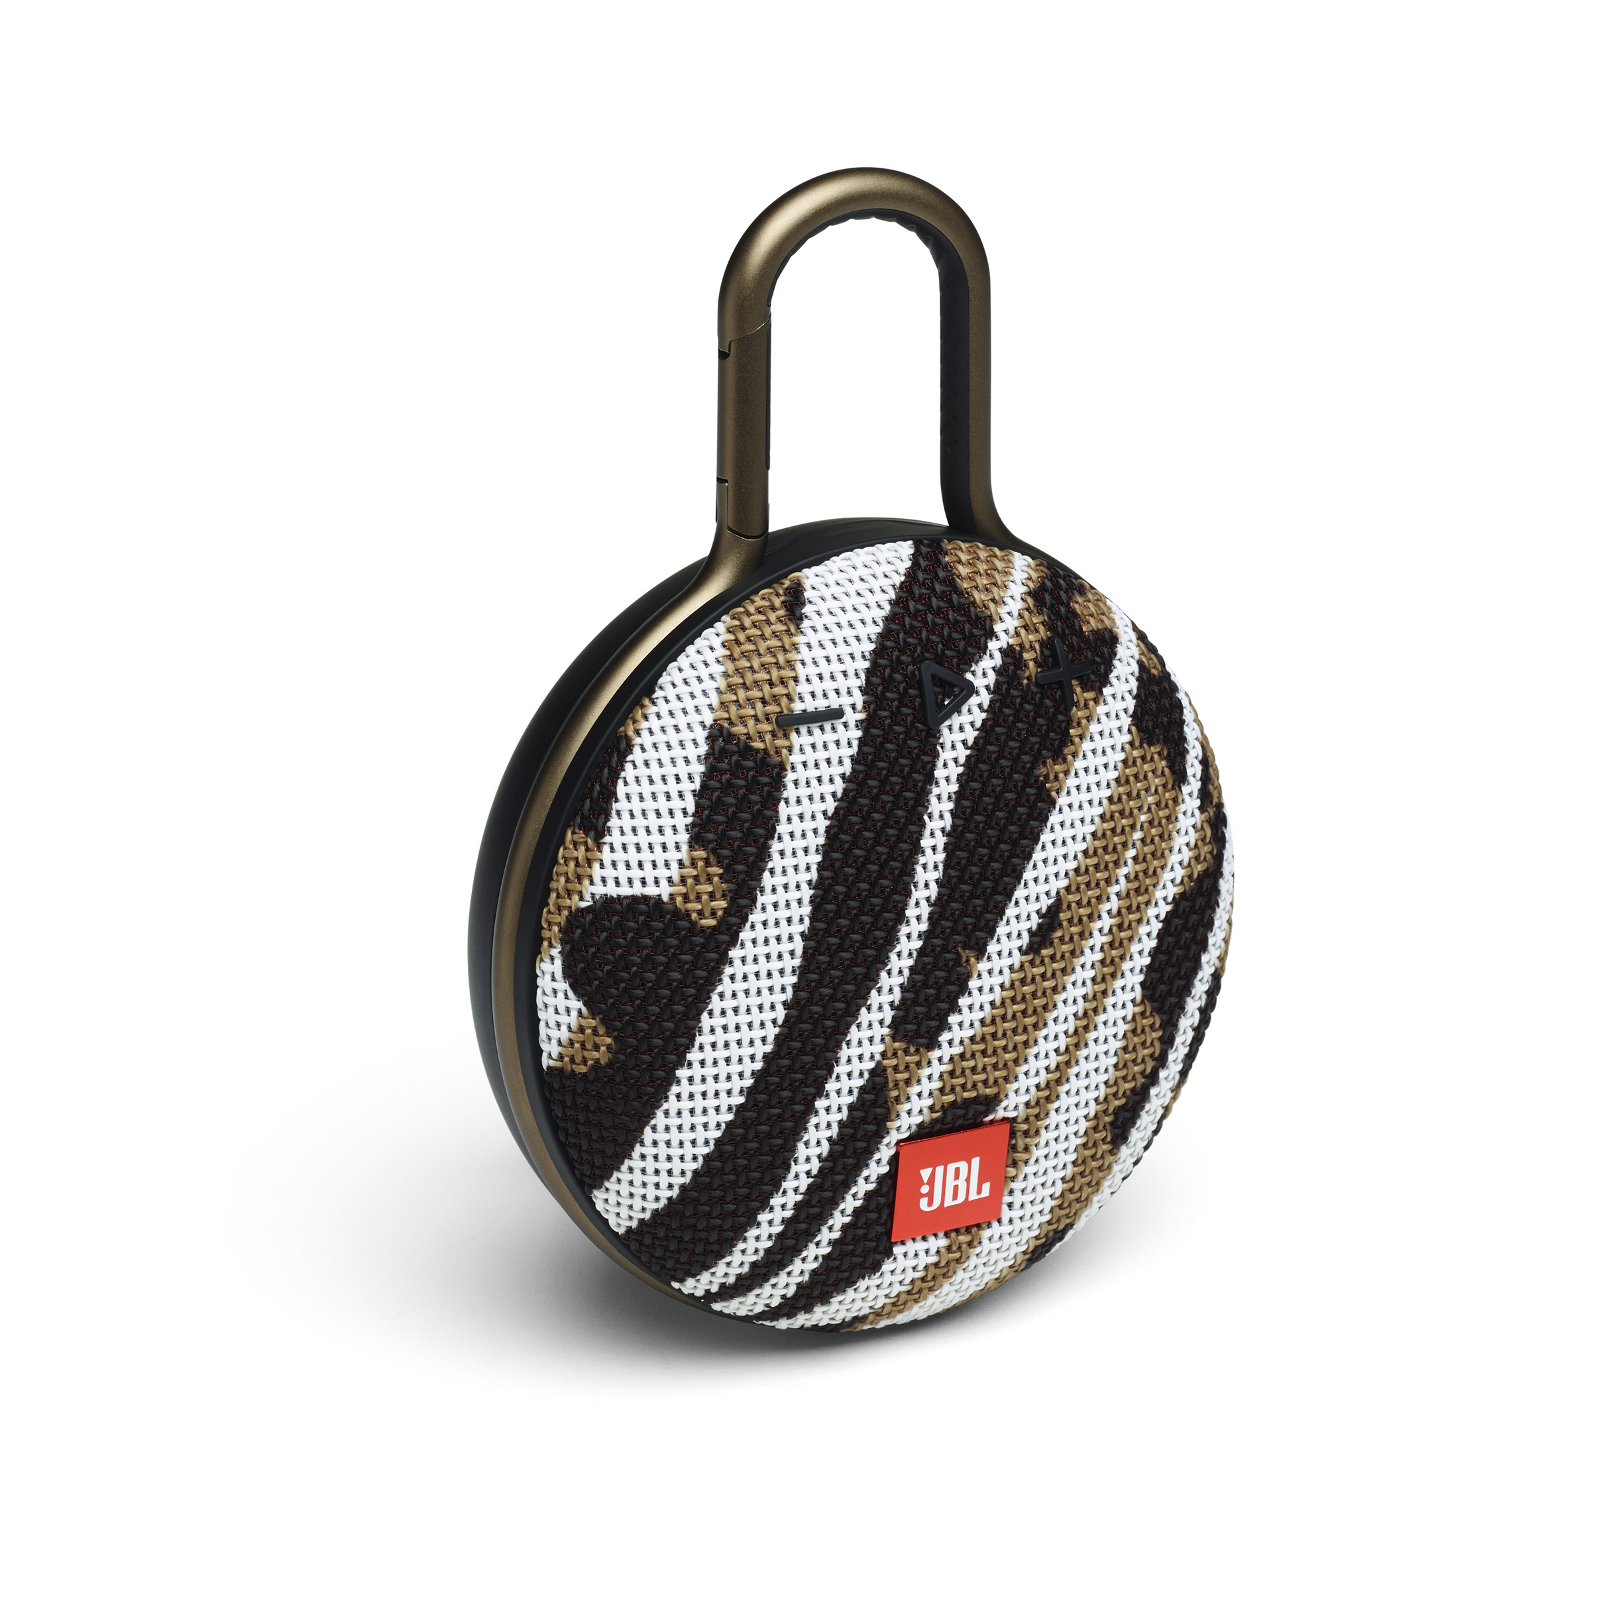 JBL CLIP 3 - BlackWhite/Brown Camo - Portable Bluetooth® speaker - Hero